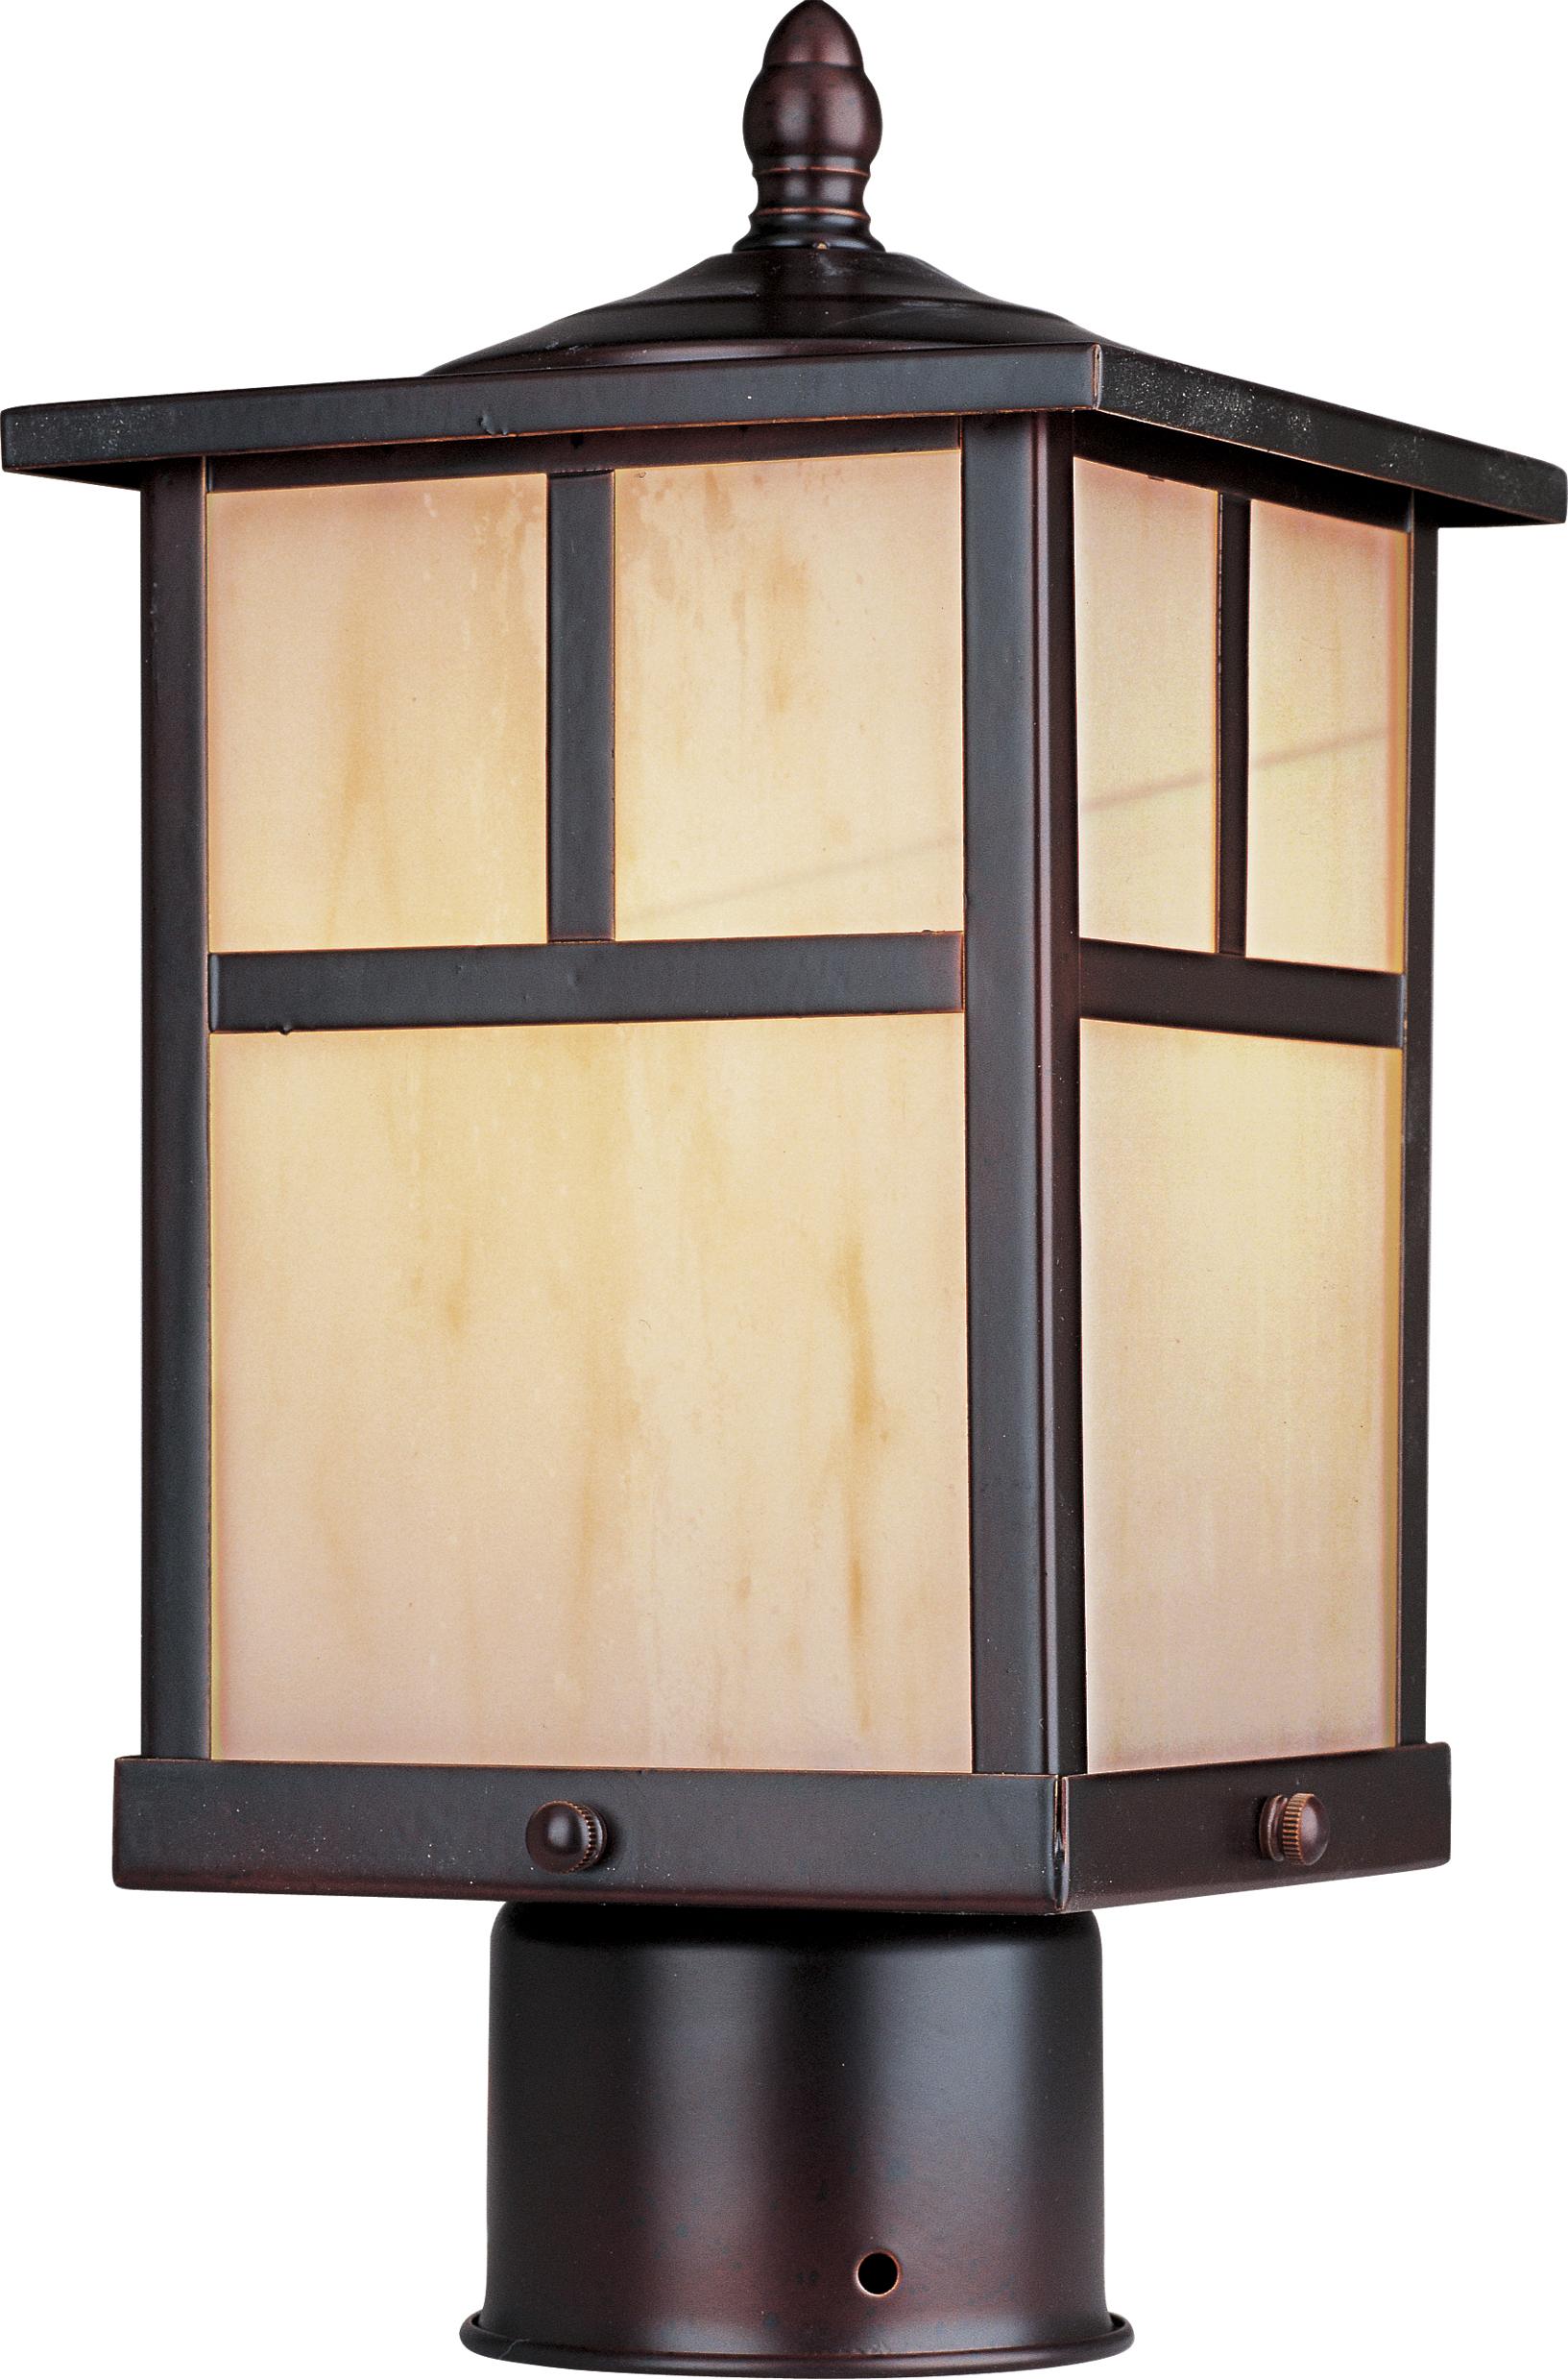 Coldwater LED Outdoor Post Lantern | Maxim Lighting